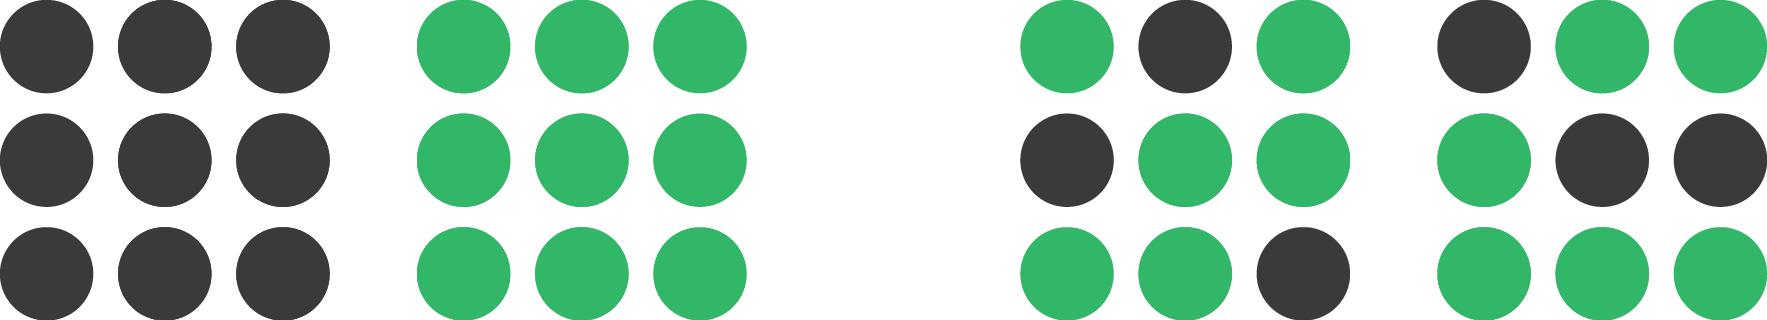 Gestalt principle of proximity